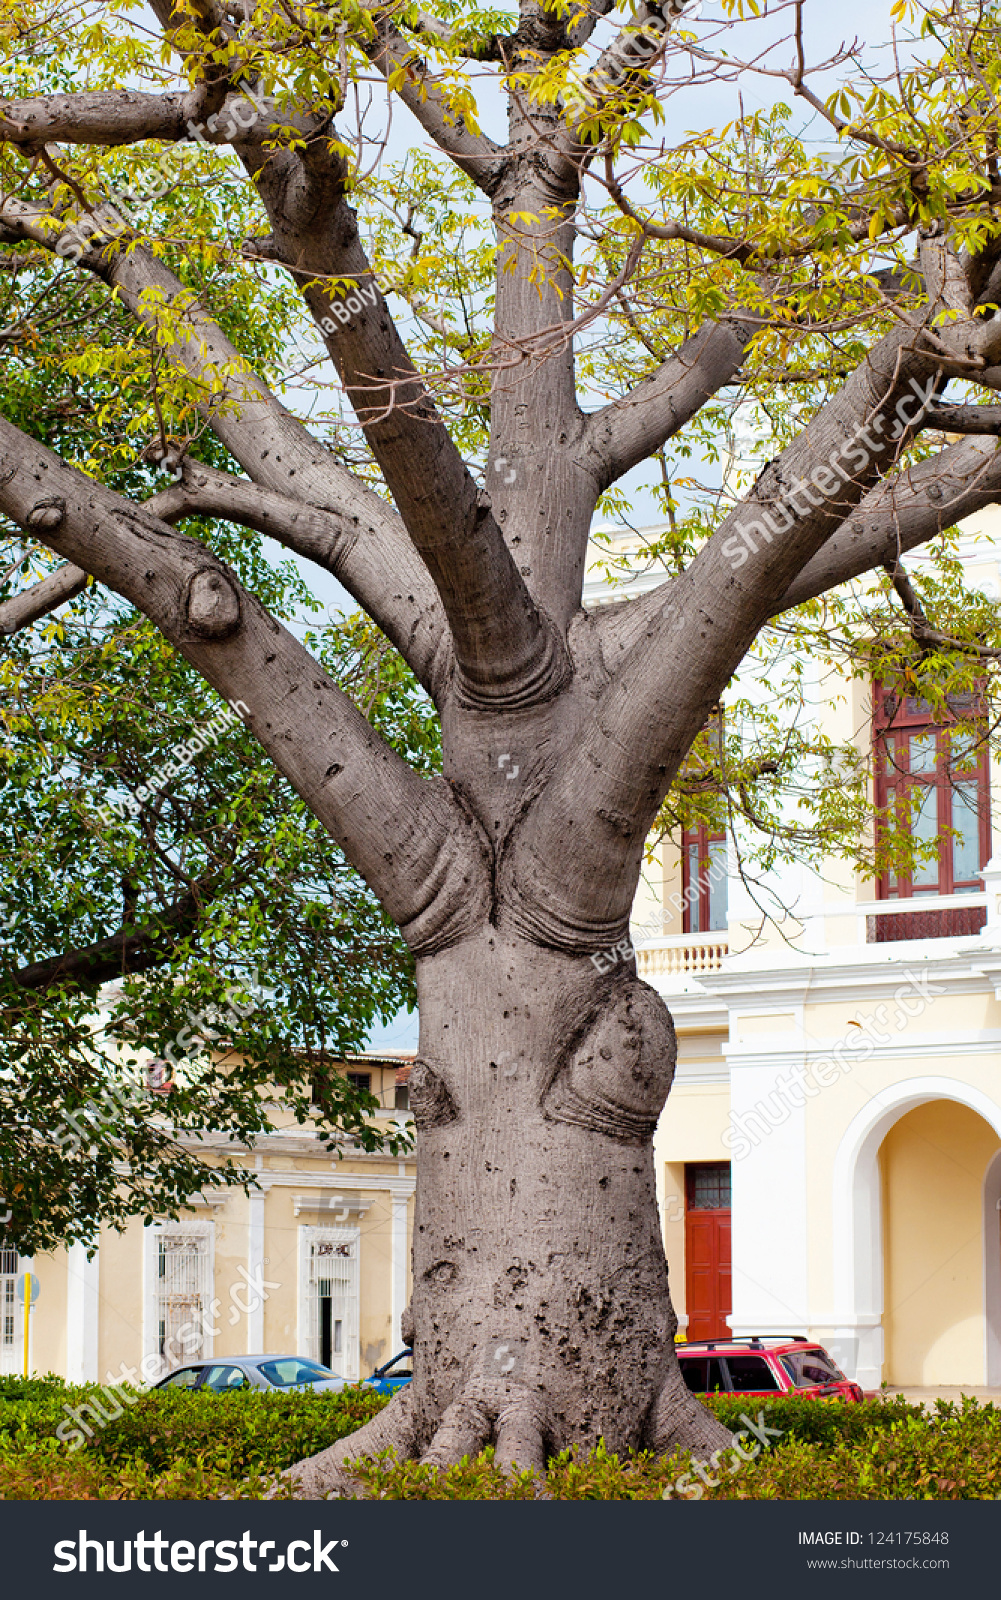 Baobab cuba